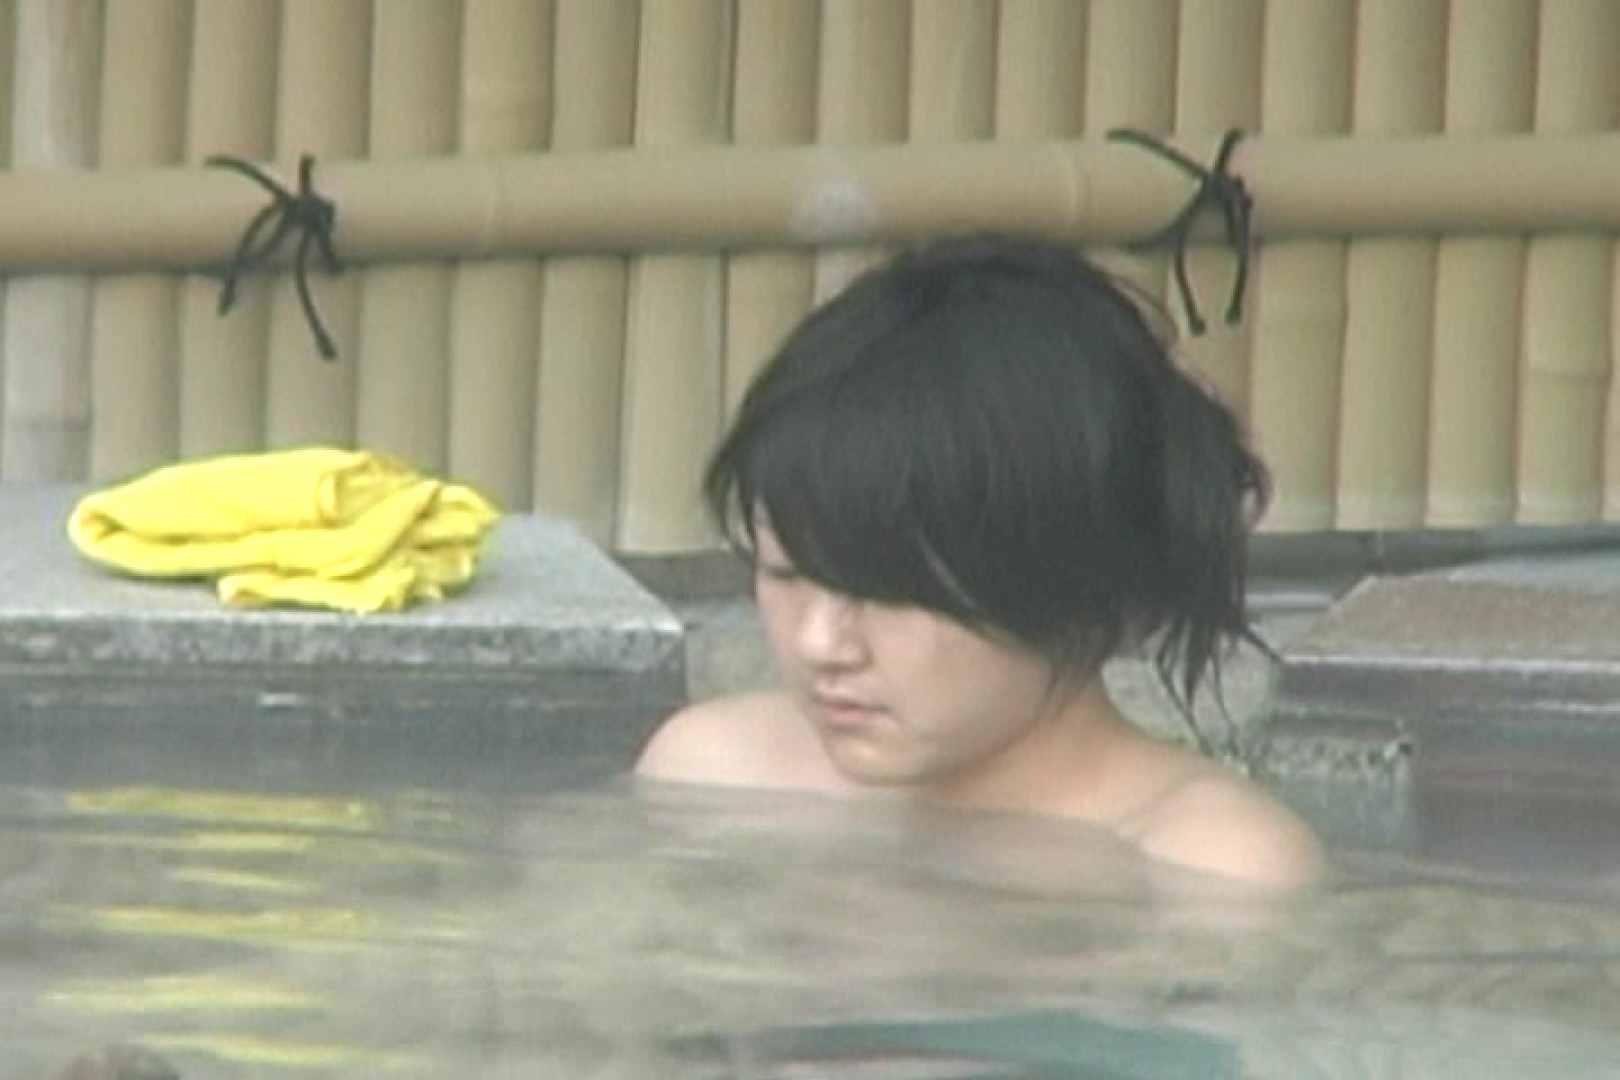 Aquaな露天風呂Vol.591 OLのプライベート ワレメ動画紹介 11pic 8